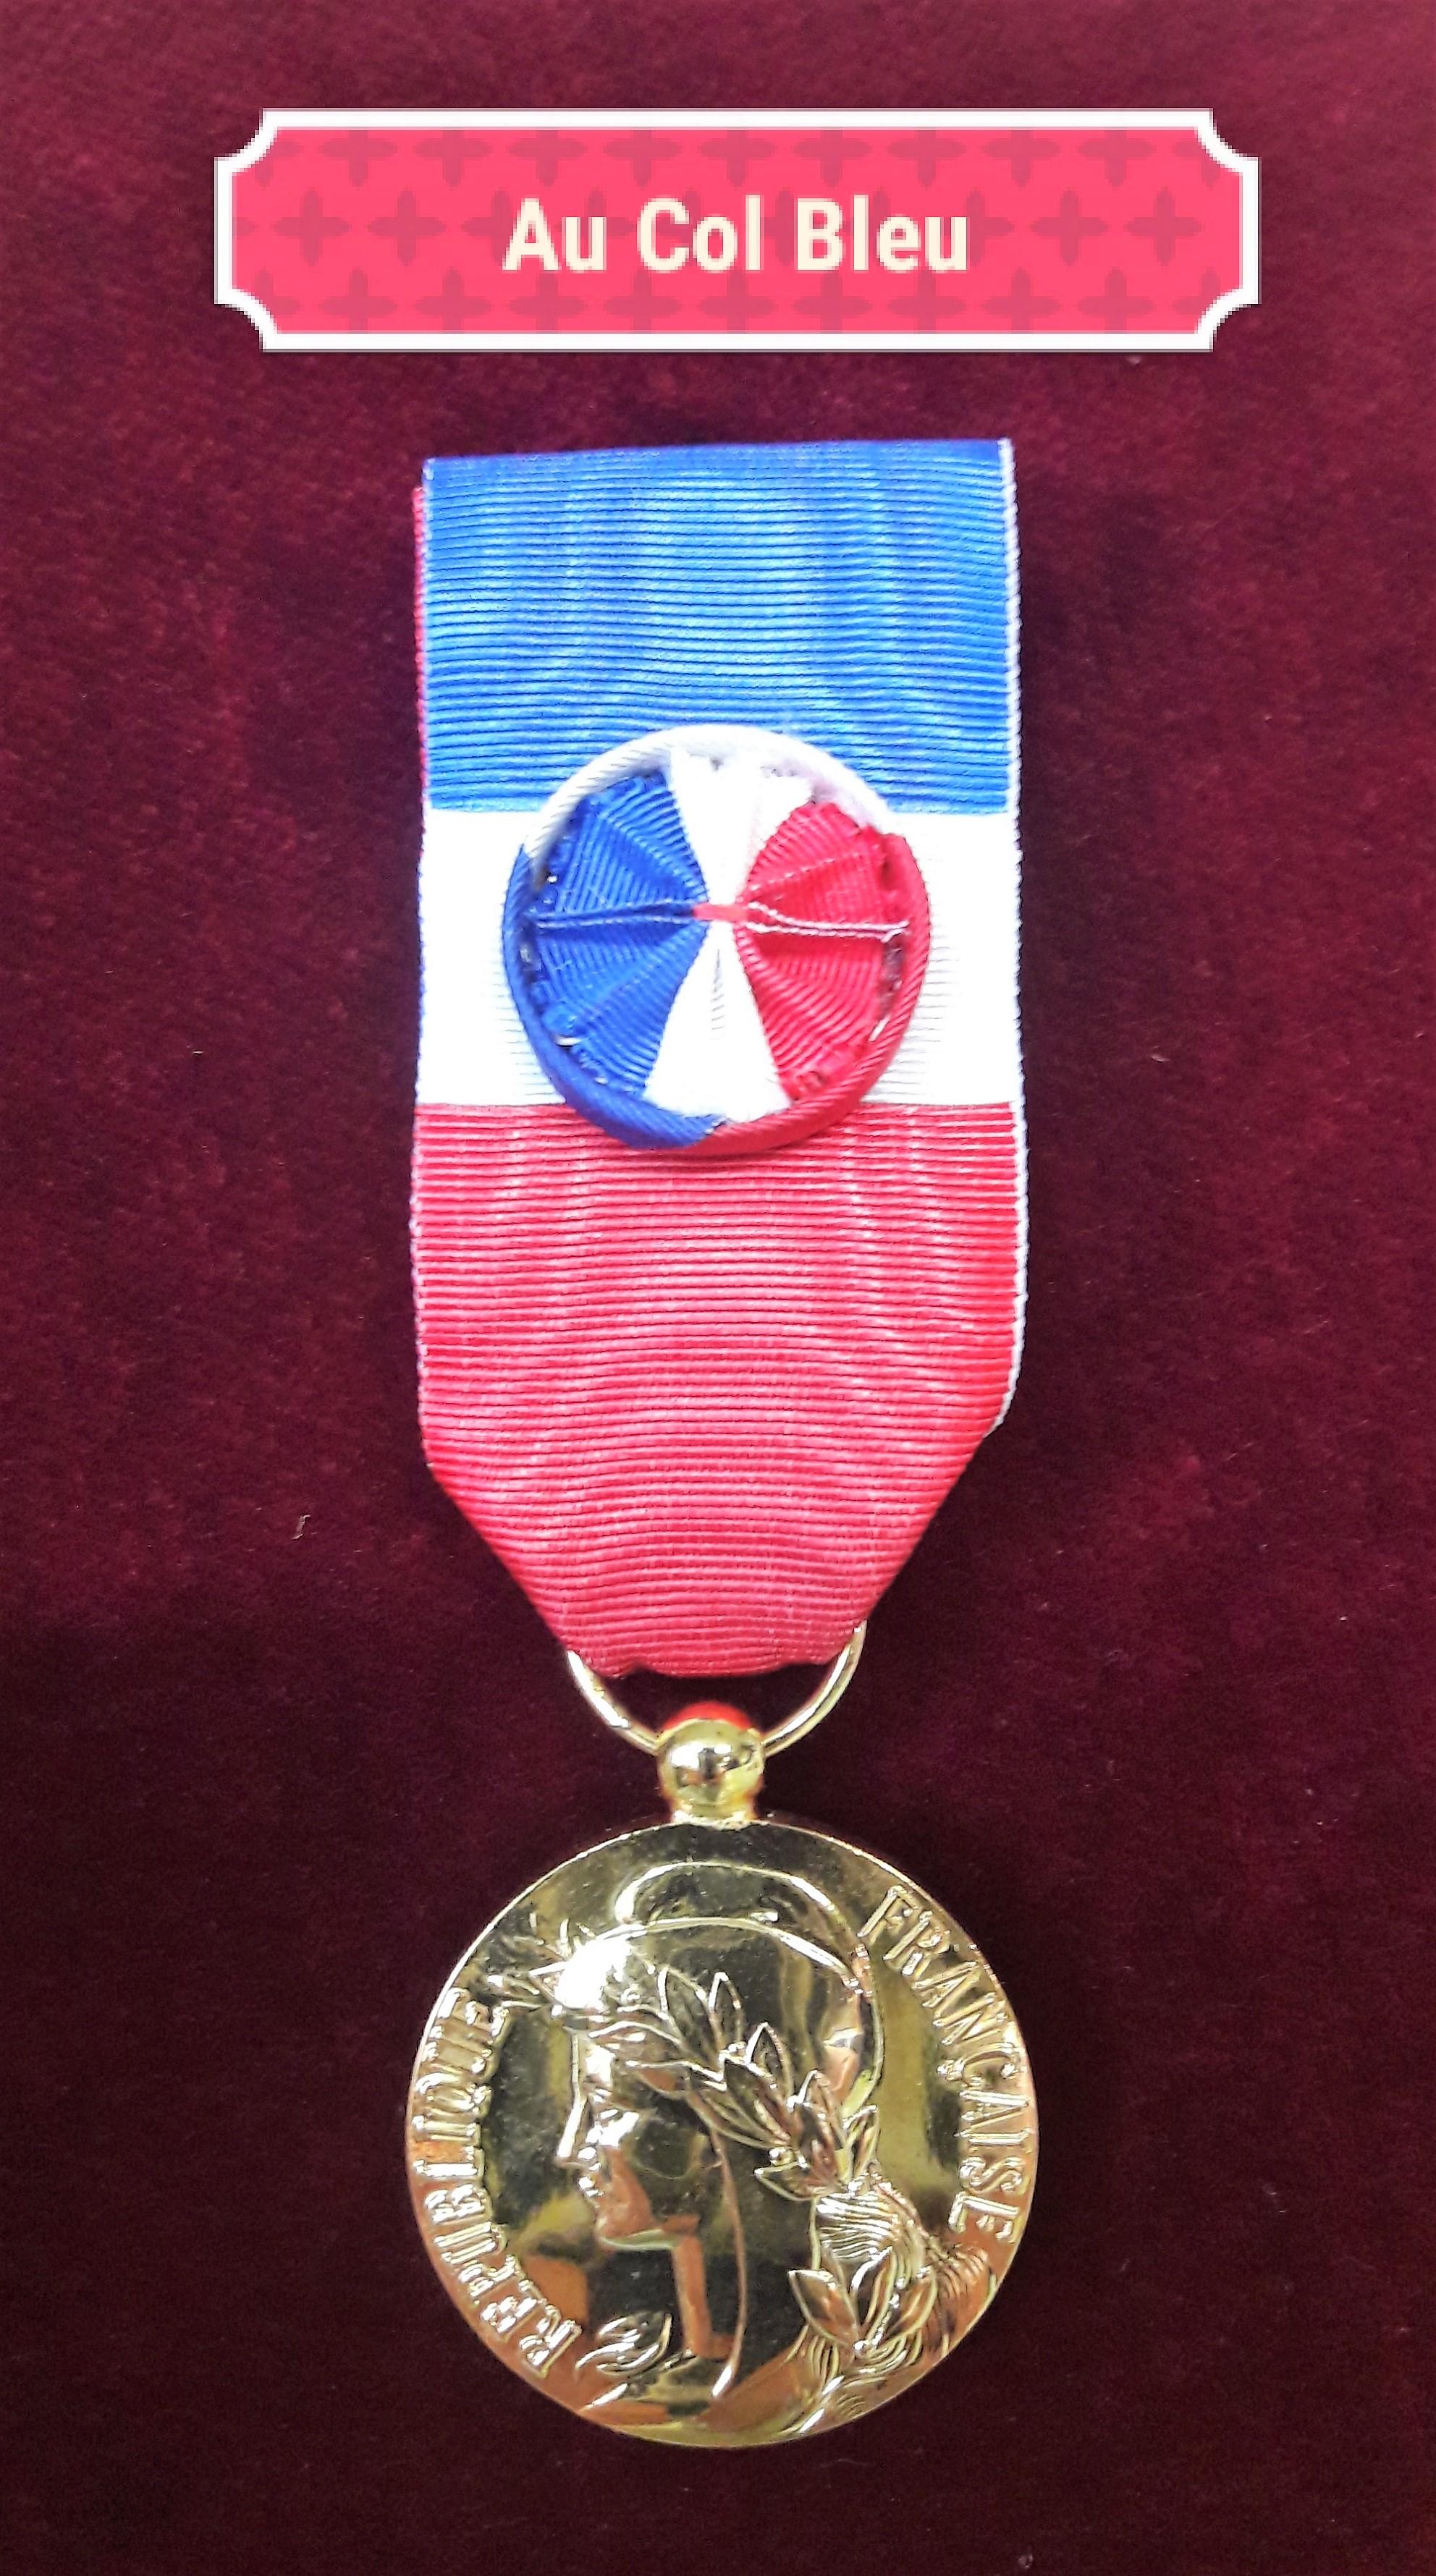 Medaille Ordonnance 30ans Travail Bronze Dore D00904 Au Col Bleu